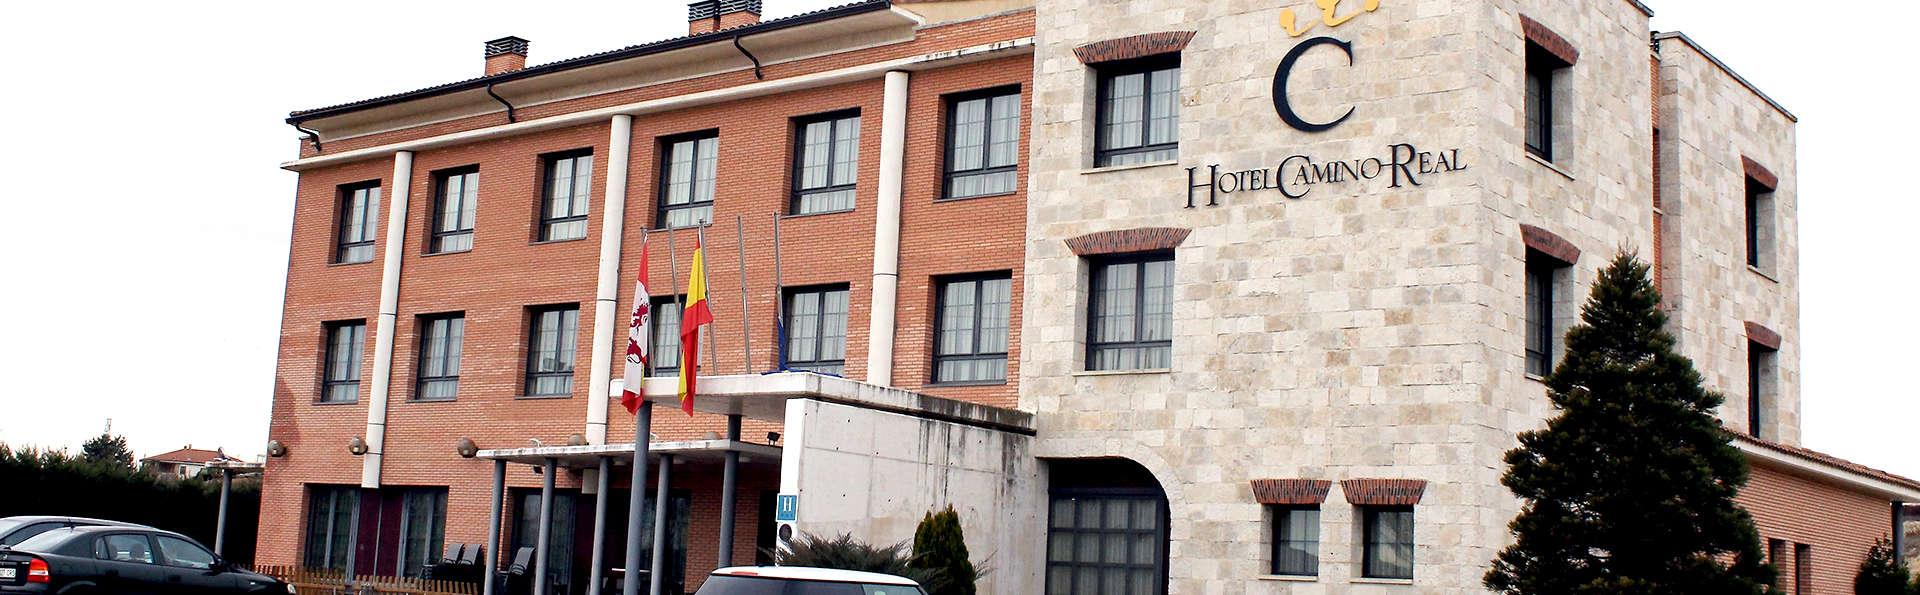 Hotel Camino Real - Edit_Front2.jpg